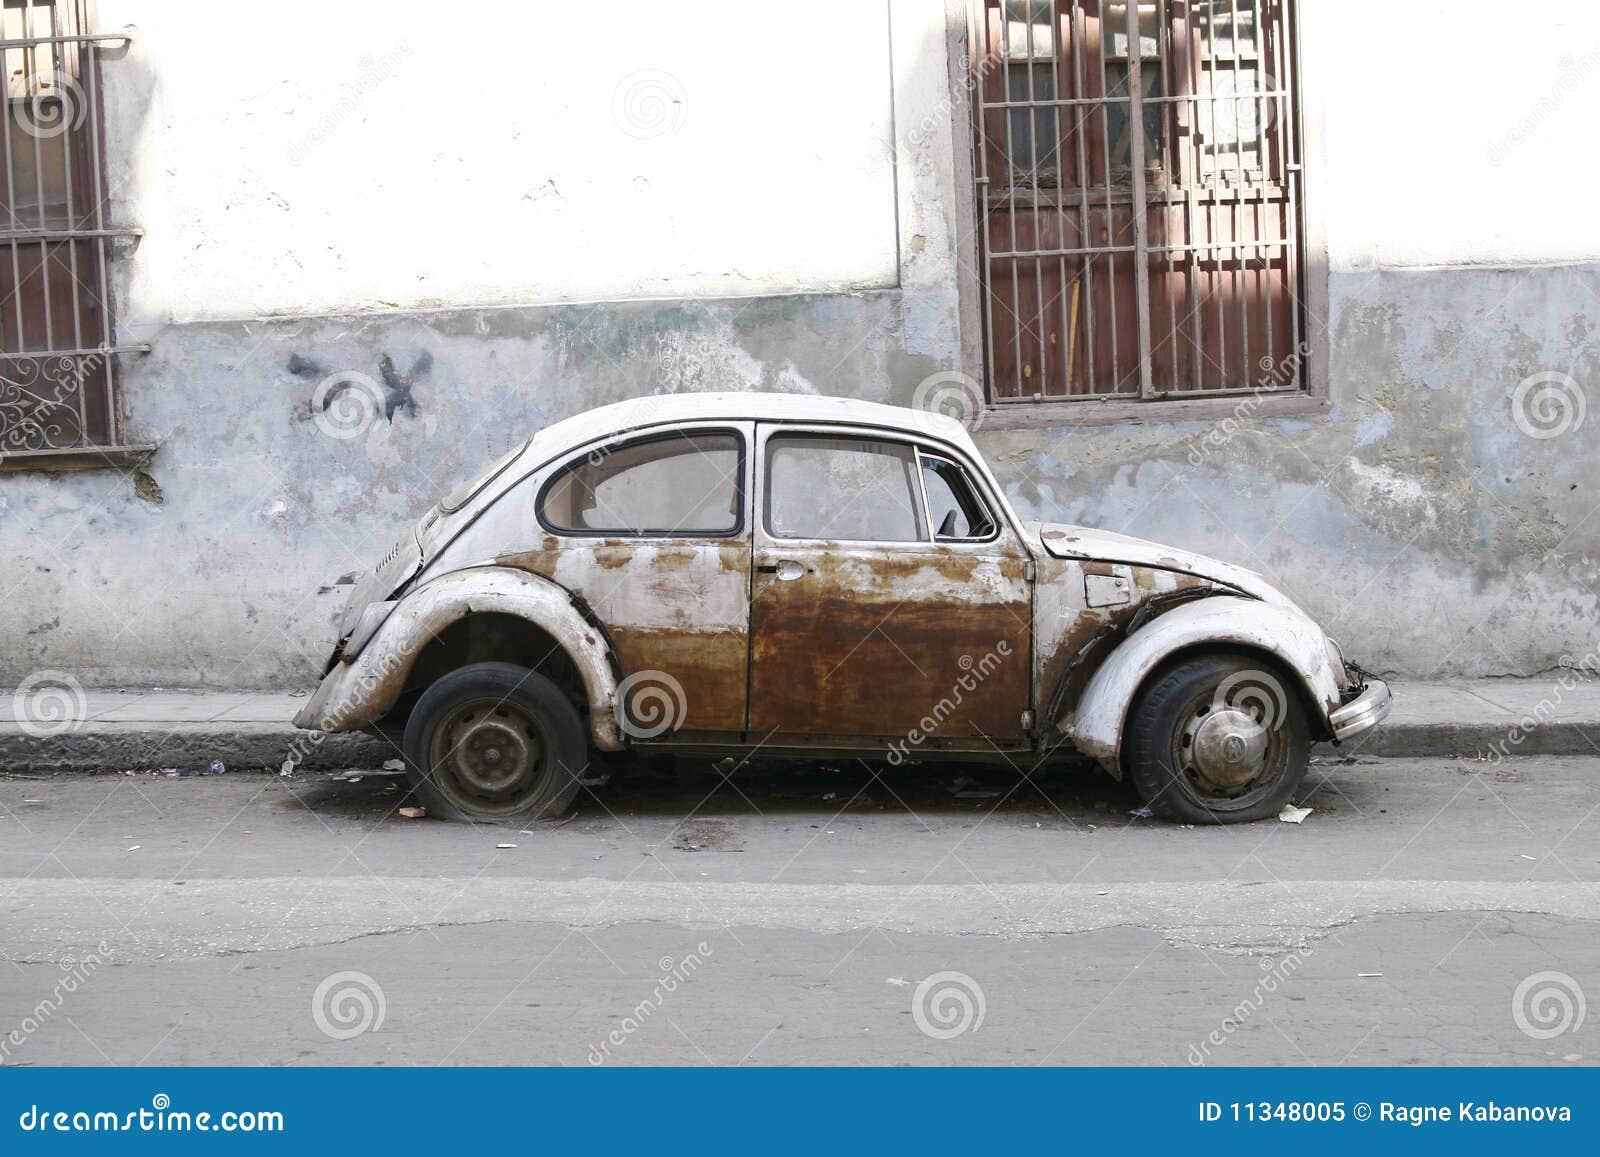 Very old car. Havana, Cuba